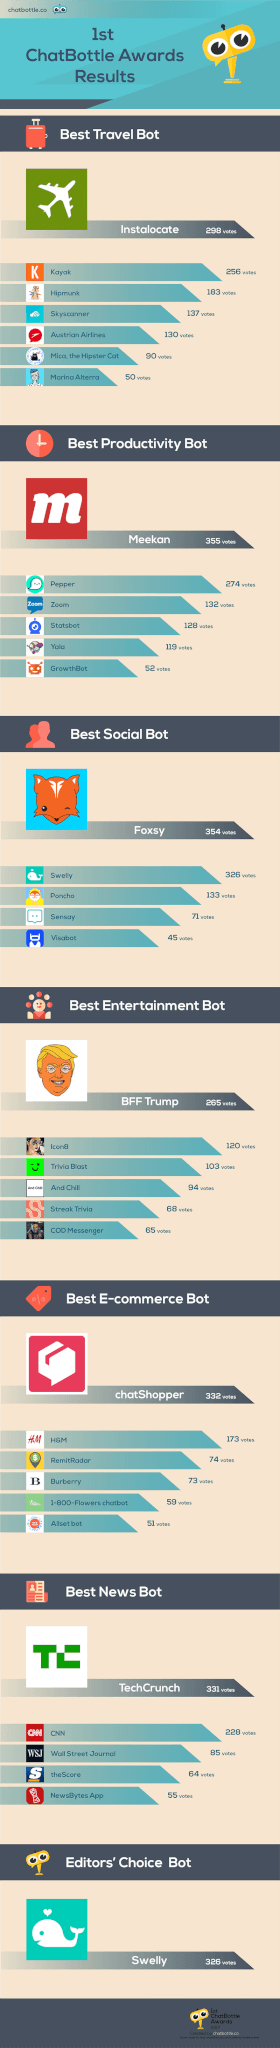 1st-chatbottle-awards-results-best-bots-infographics-2